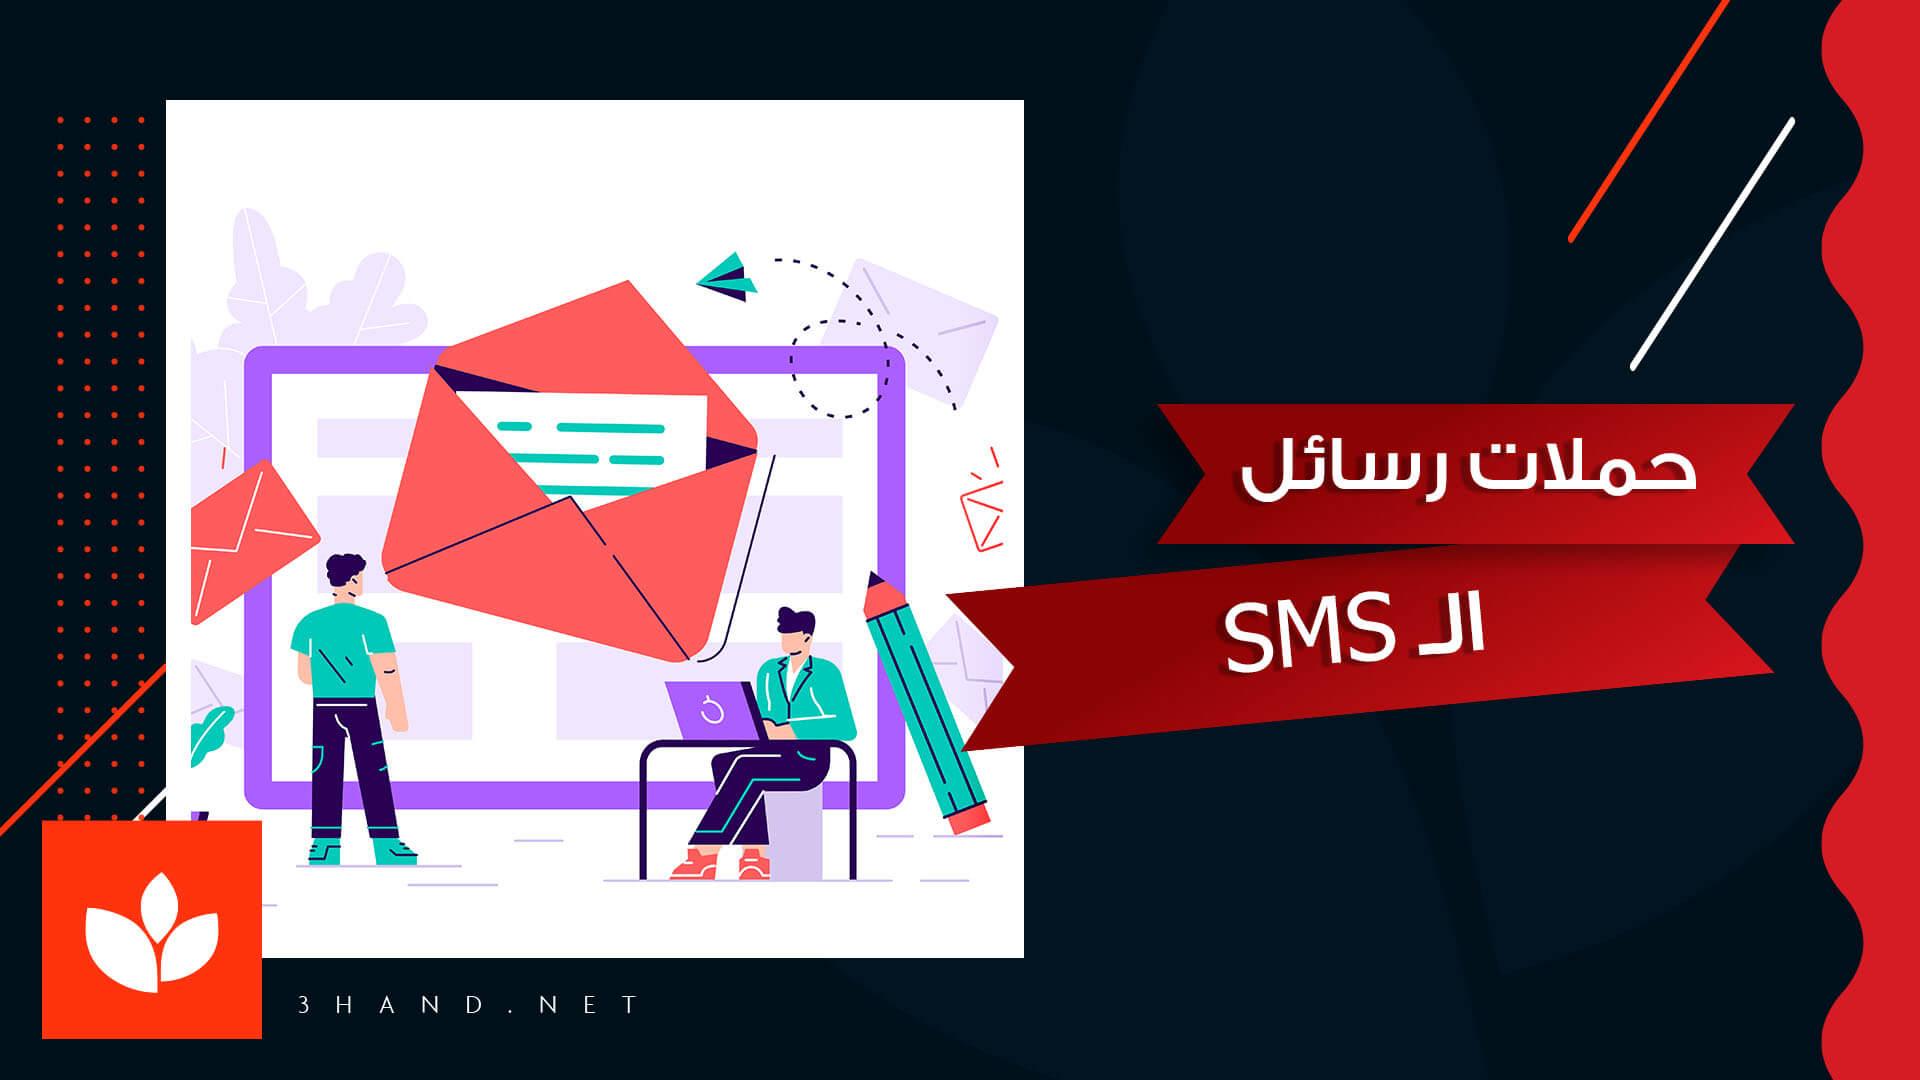 حملات رسائل الـ sms